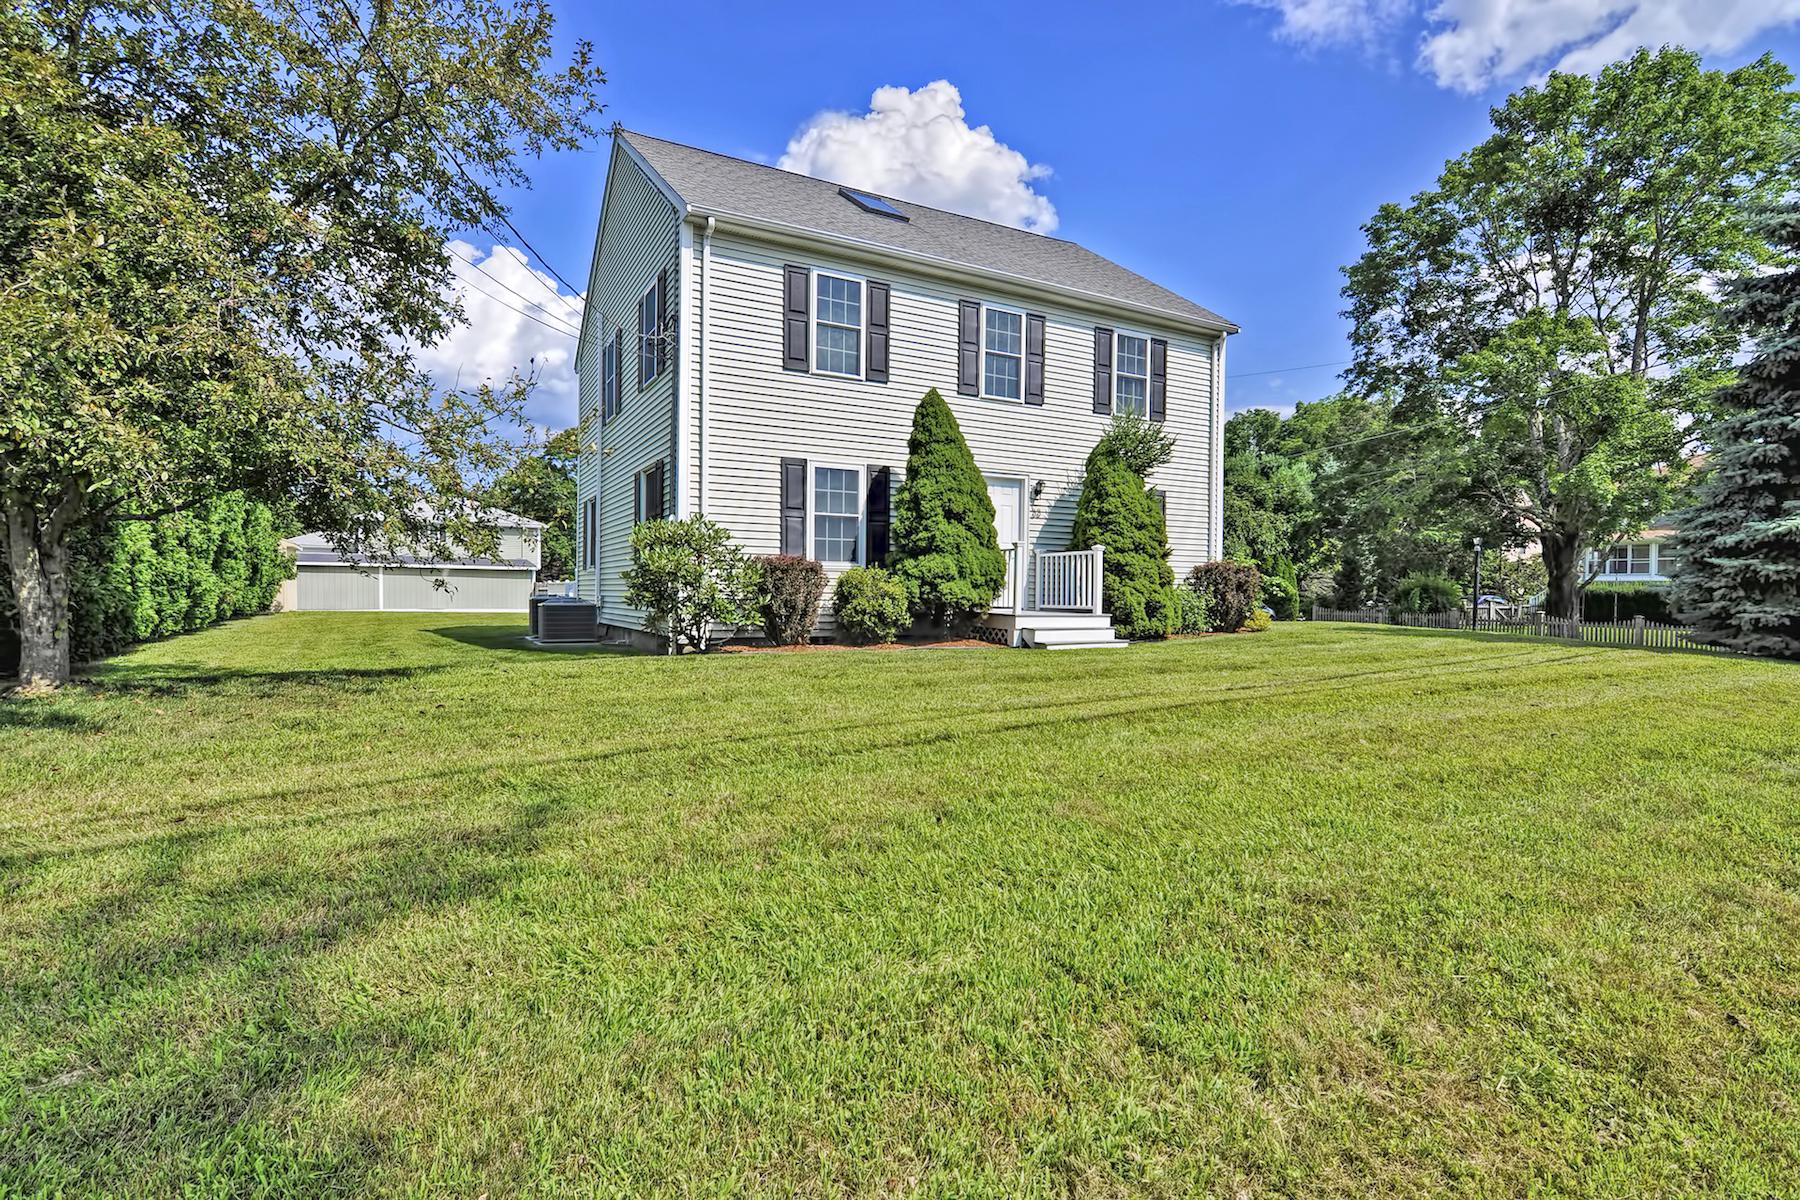 Single Family Homes pour l Vente à Colonial Home - A Hidden Gem 33 Winter Street Wayland, Massachusetts 01778 États-Unis